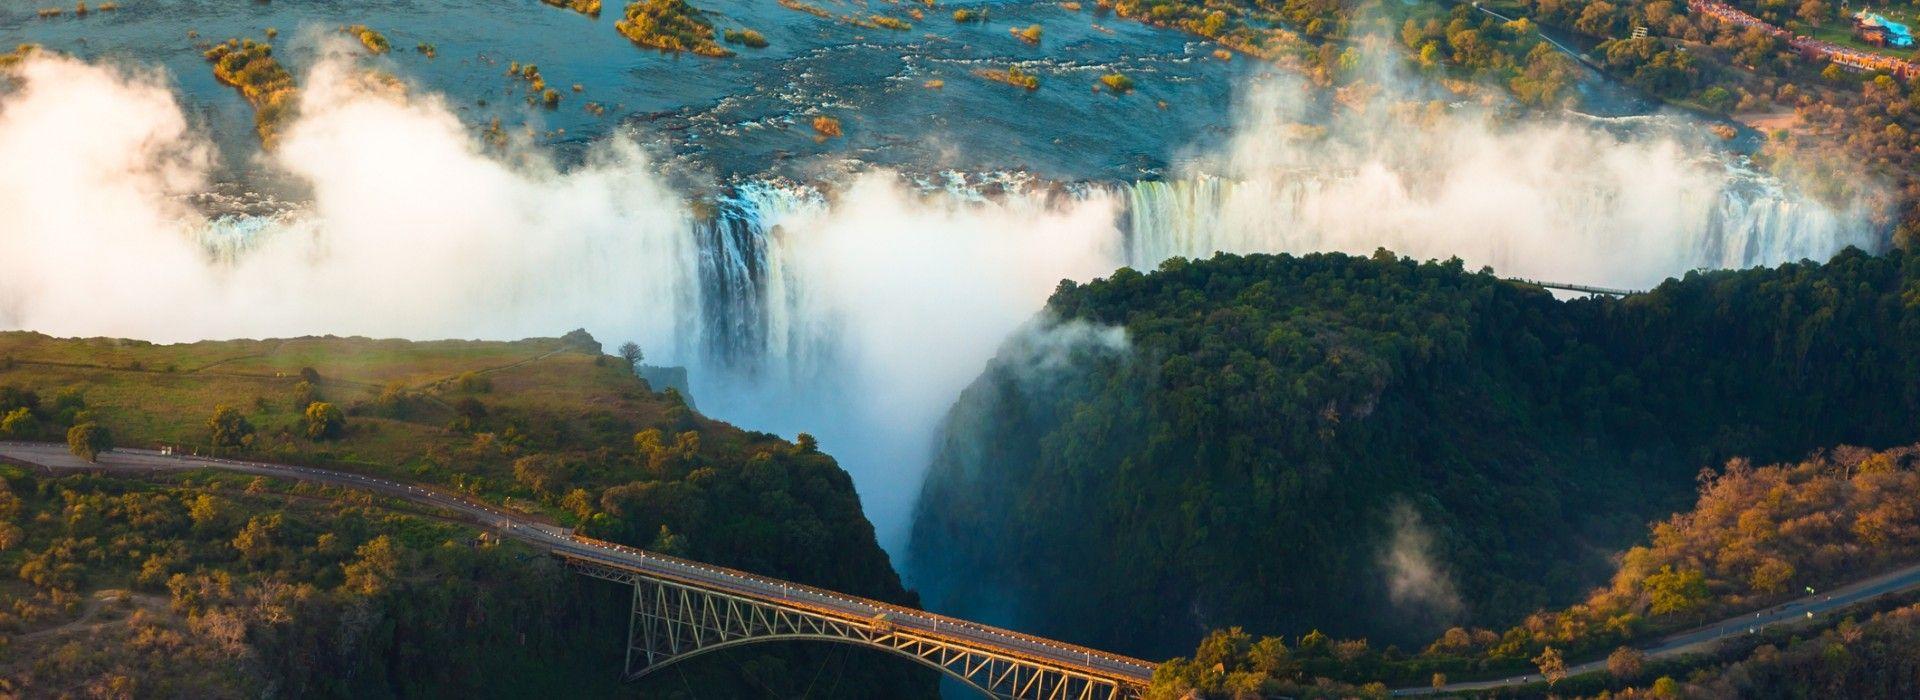 National parks Tours in Lower Zambezi National Park